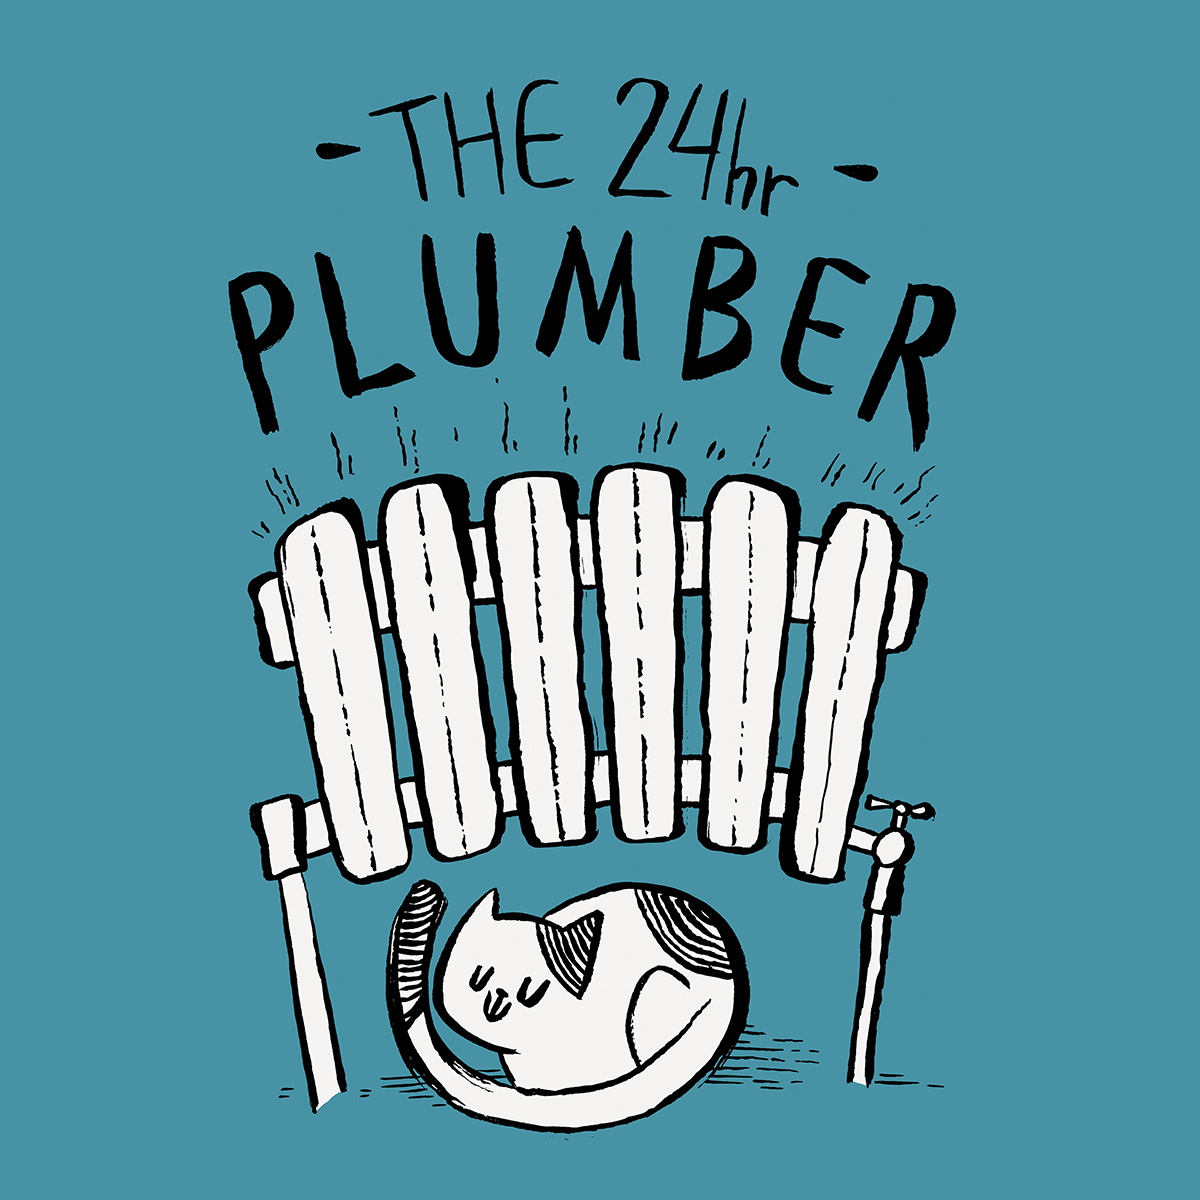 The 24hr Plumber Verified Logo